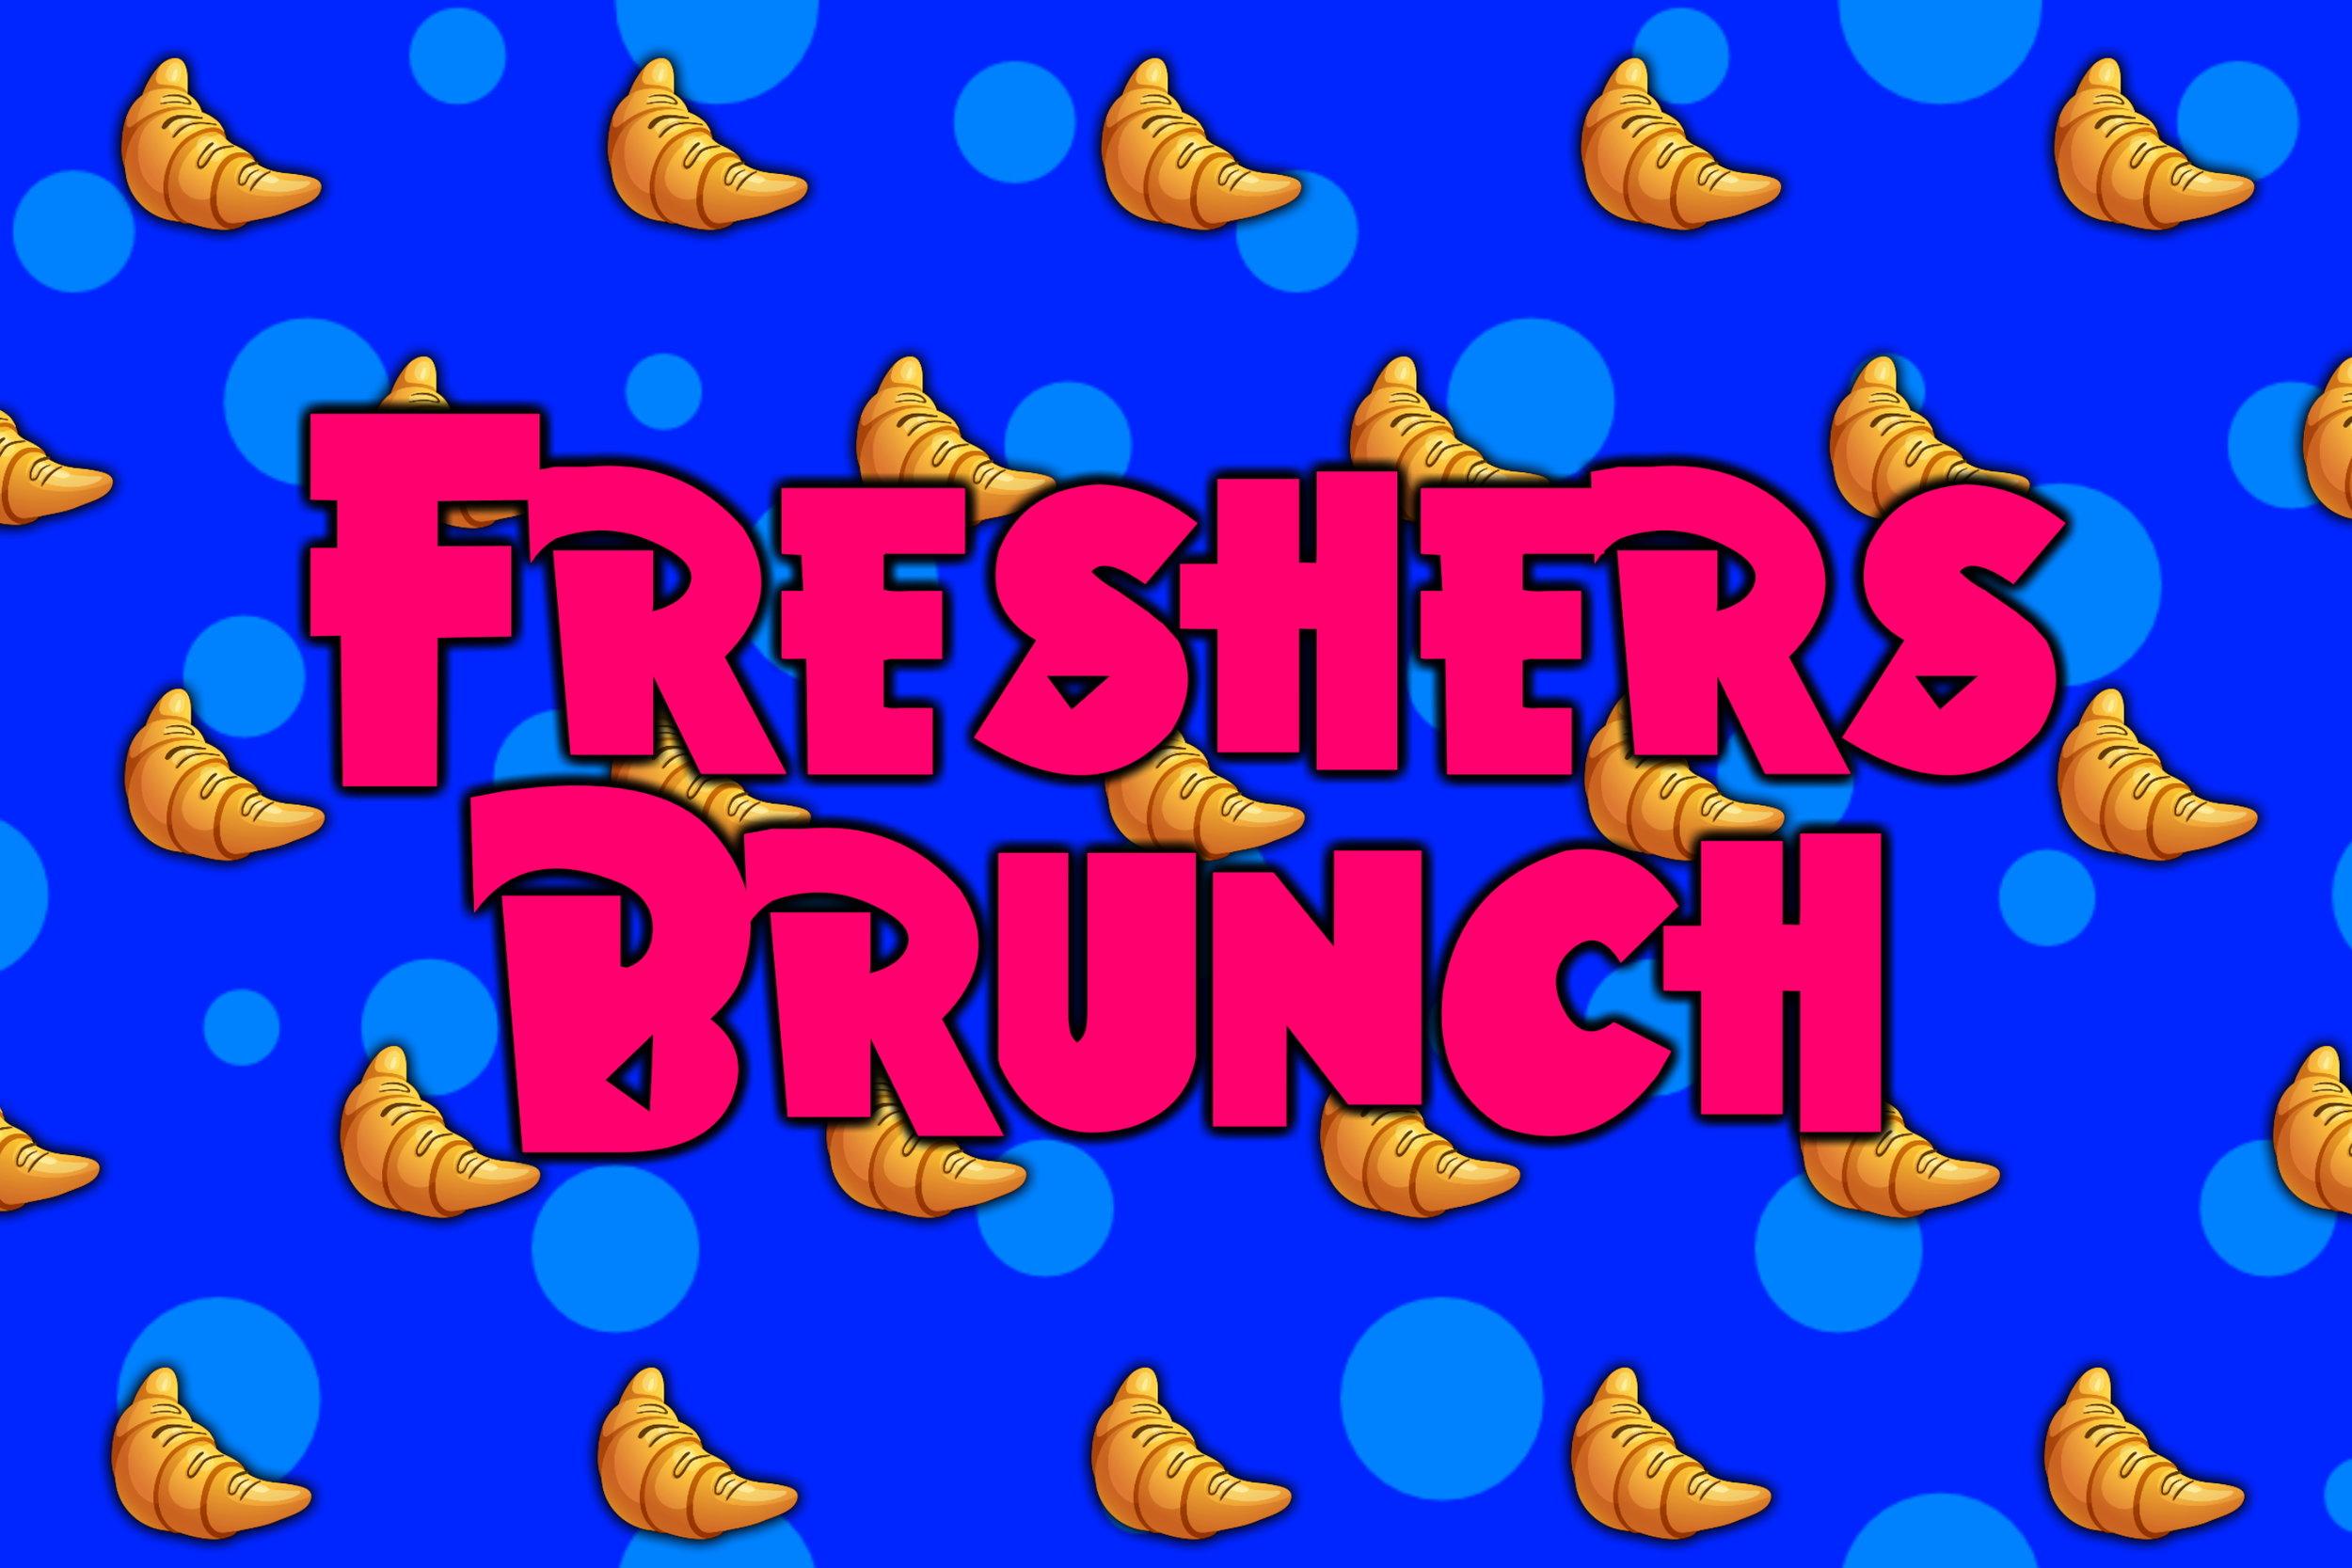 FreshersBrunch.jpg